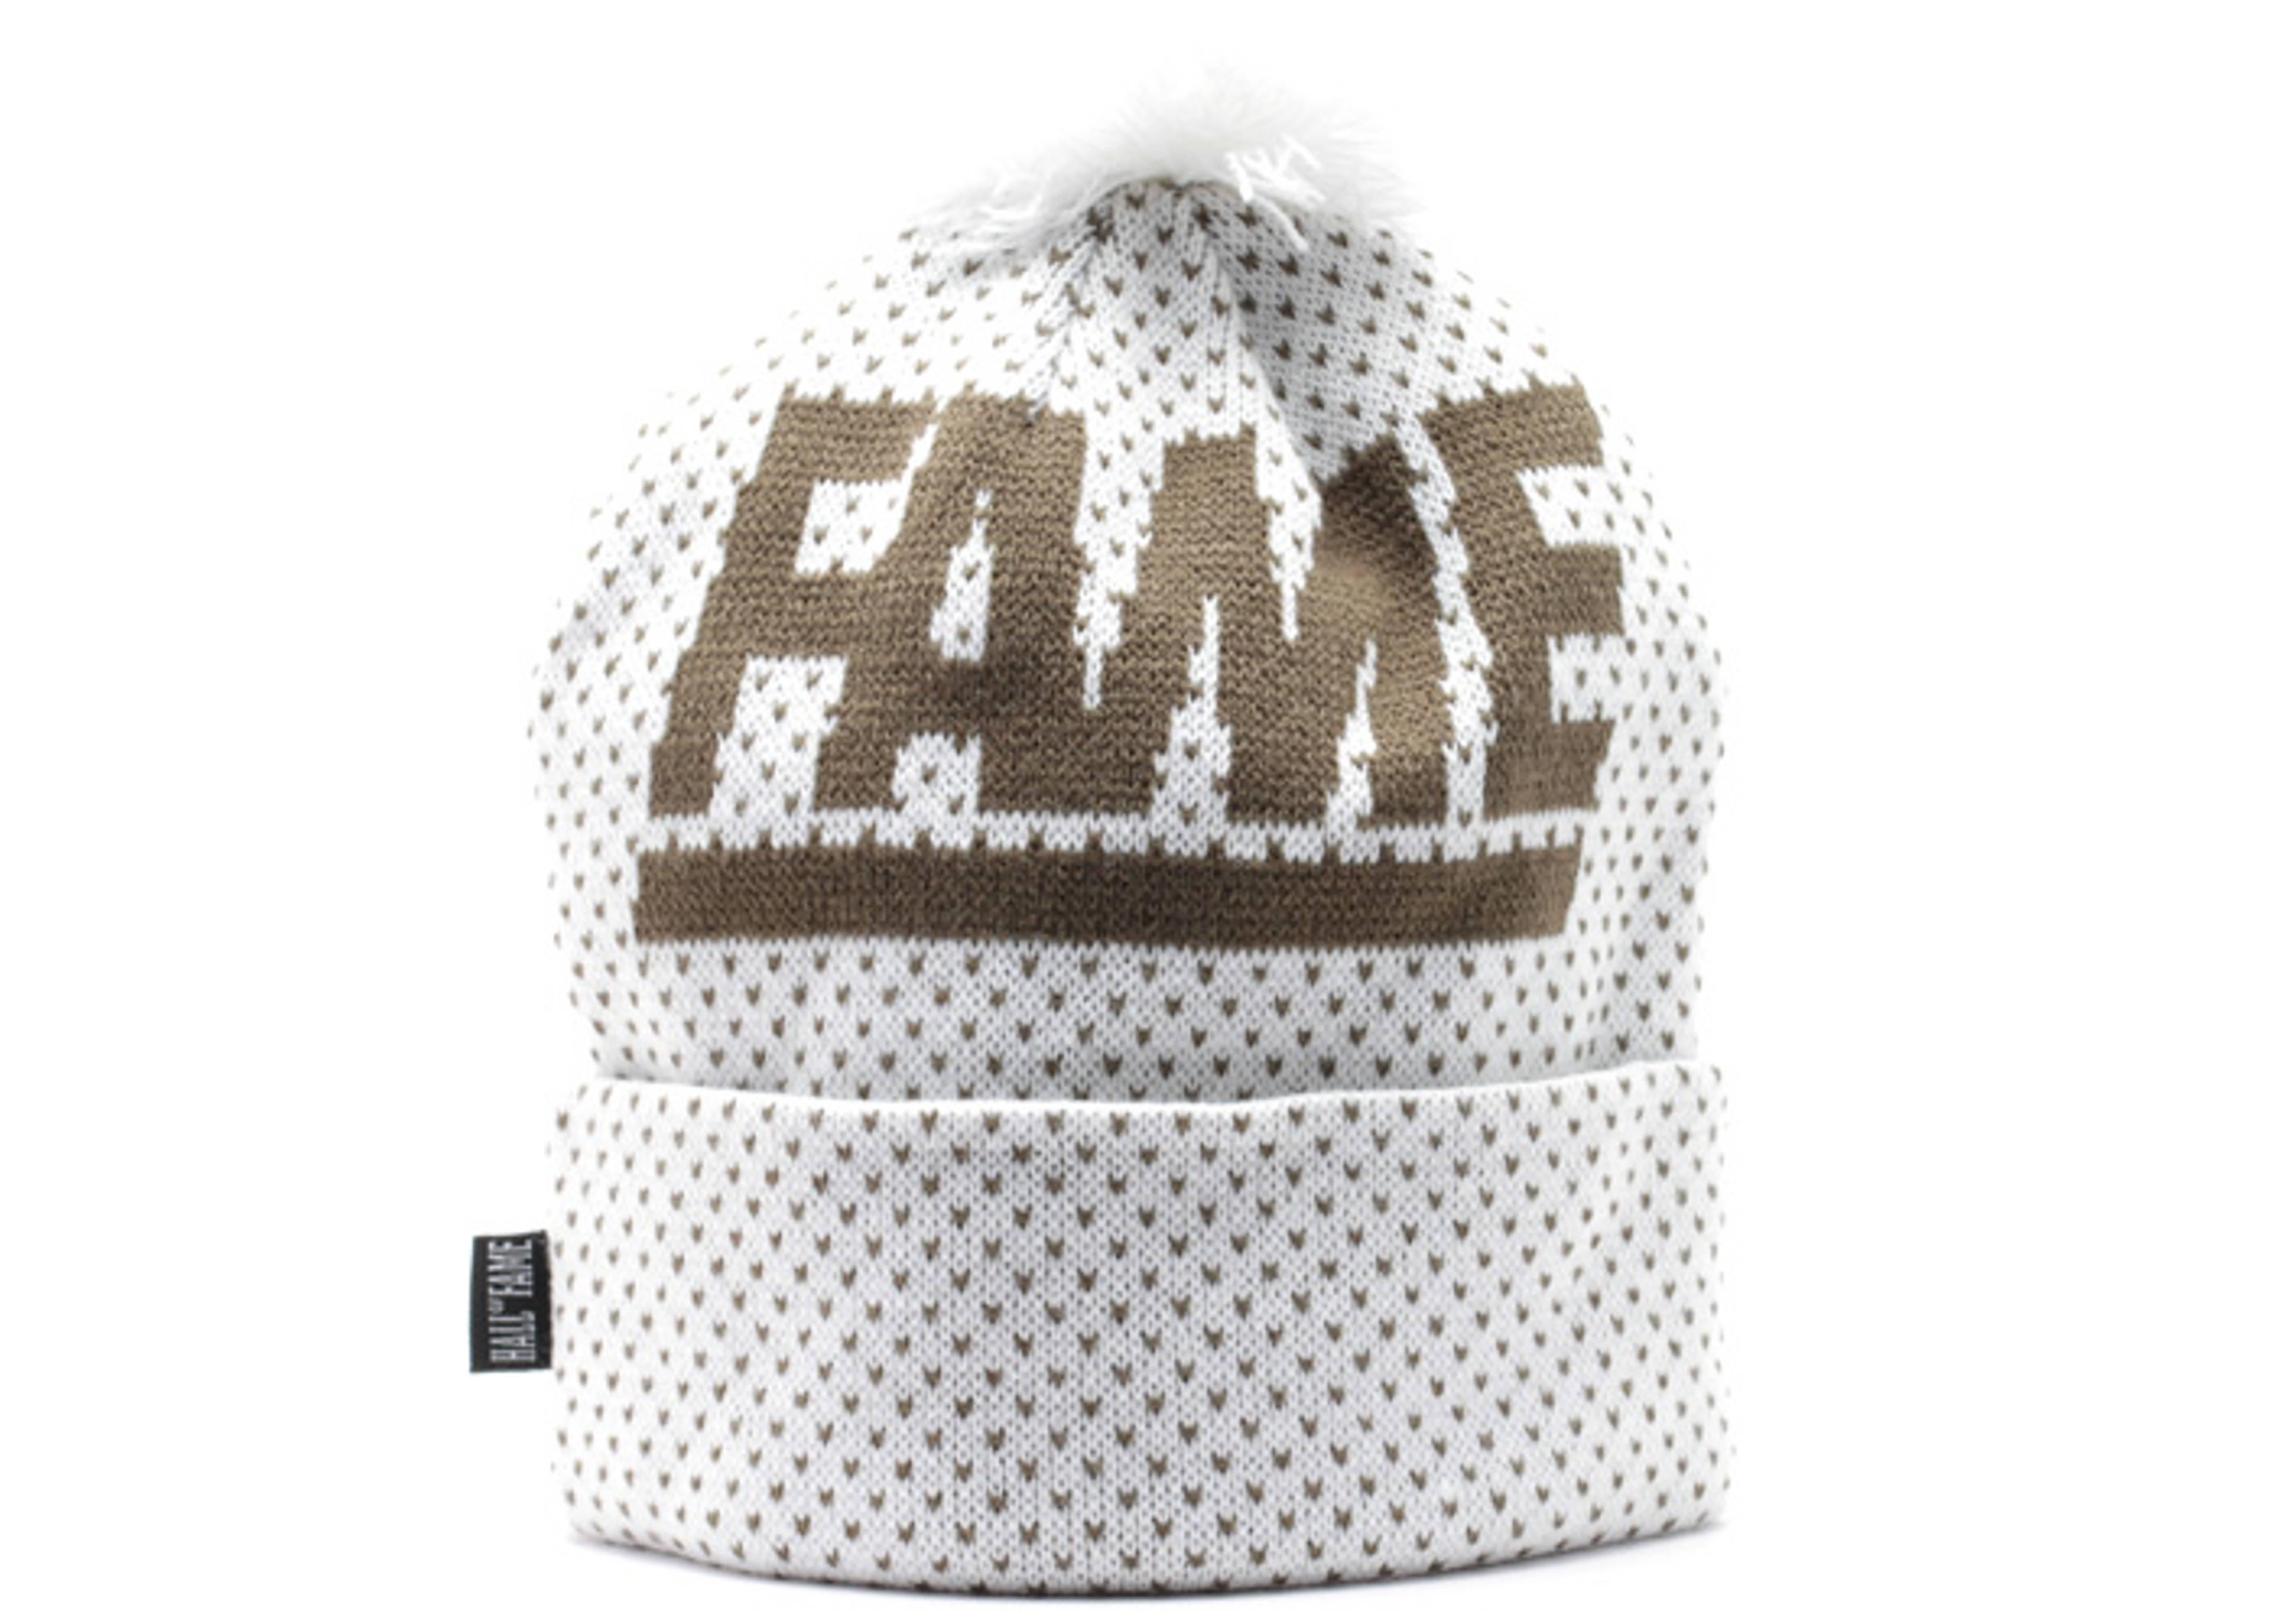 fame block cuffed pom knit beanie